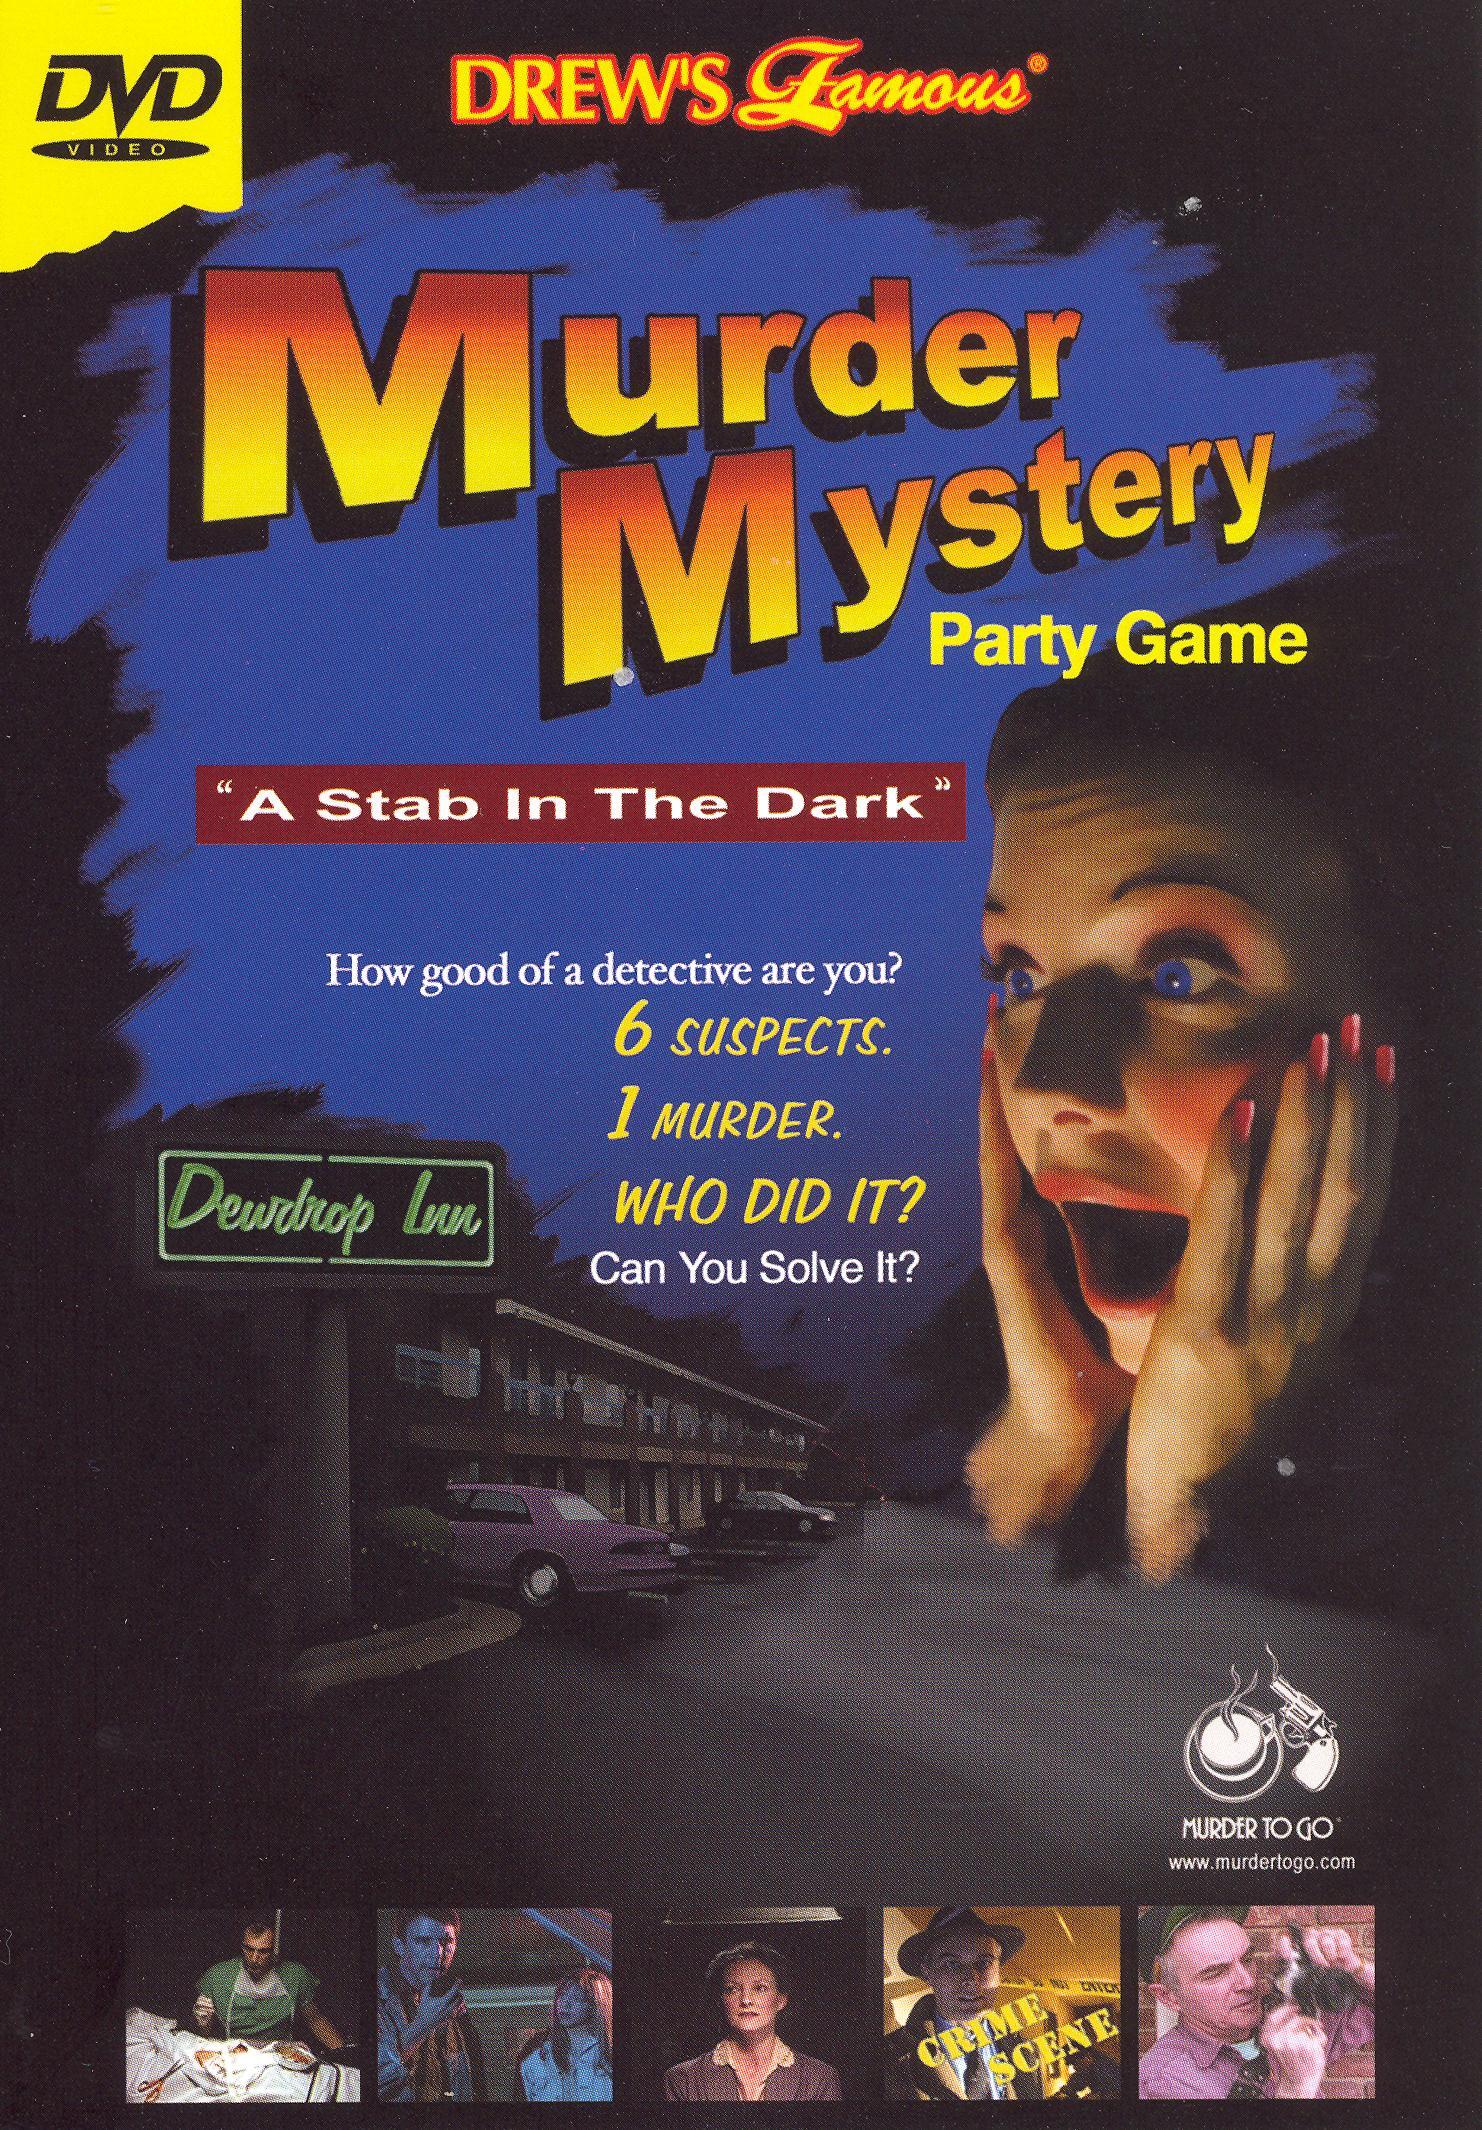 Drew's Famous Murder Mystery